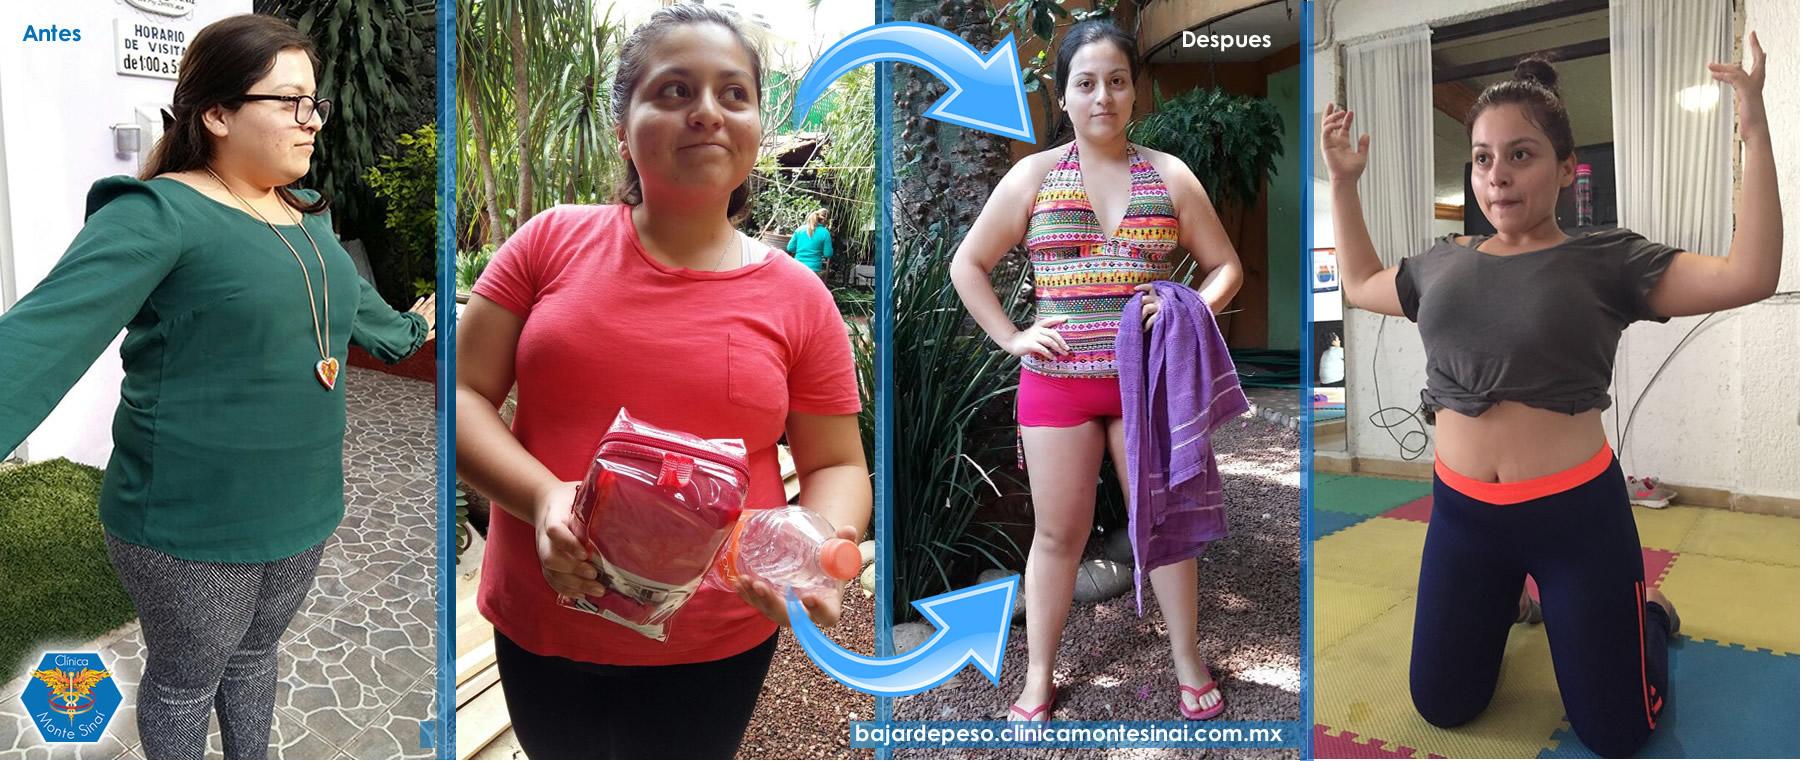 Dieta para aumentar masa muscular piernas mujeres con sal